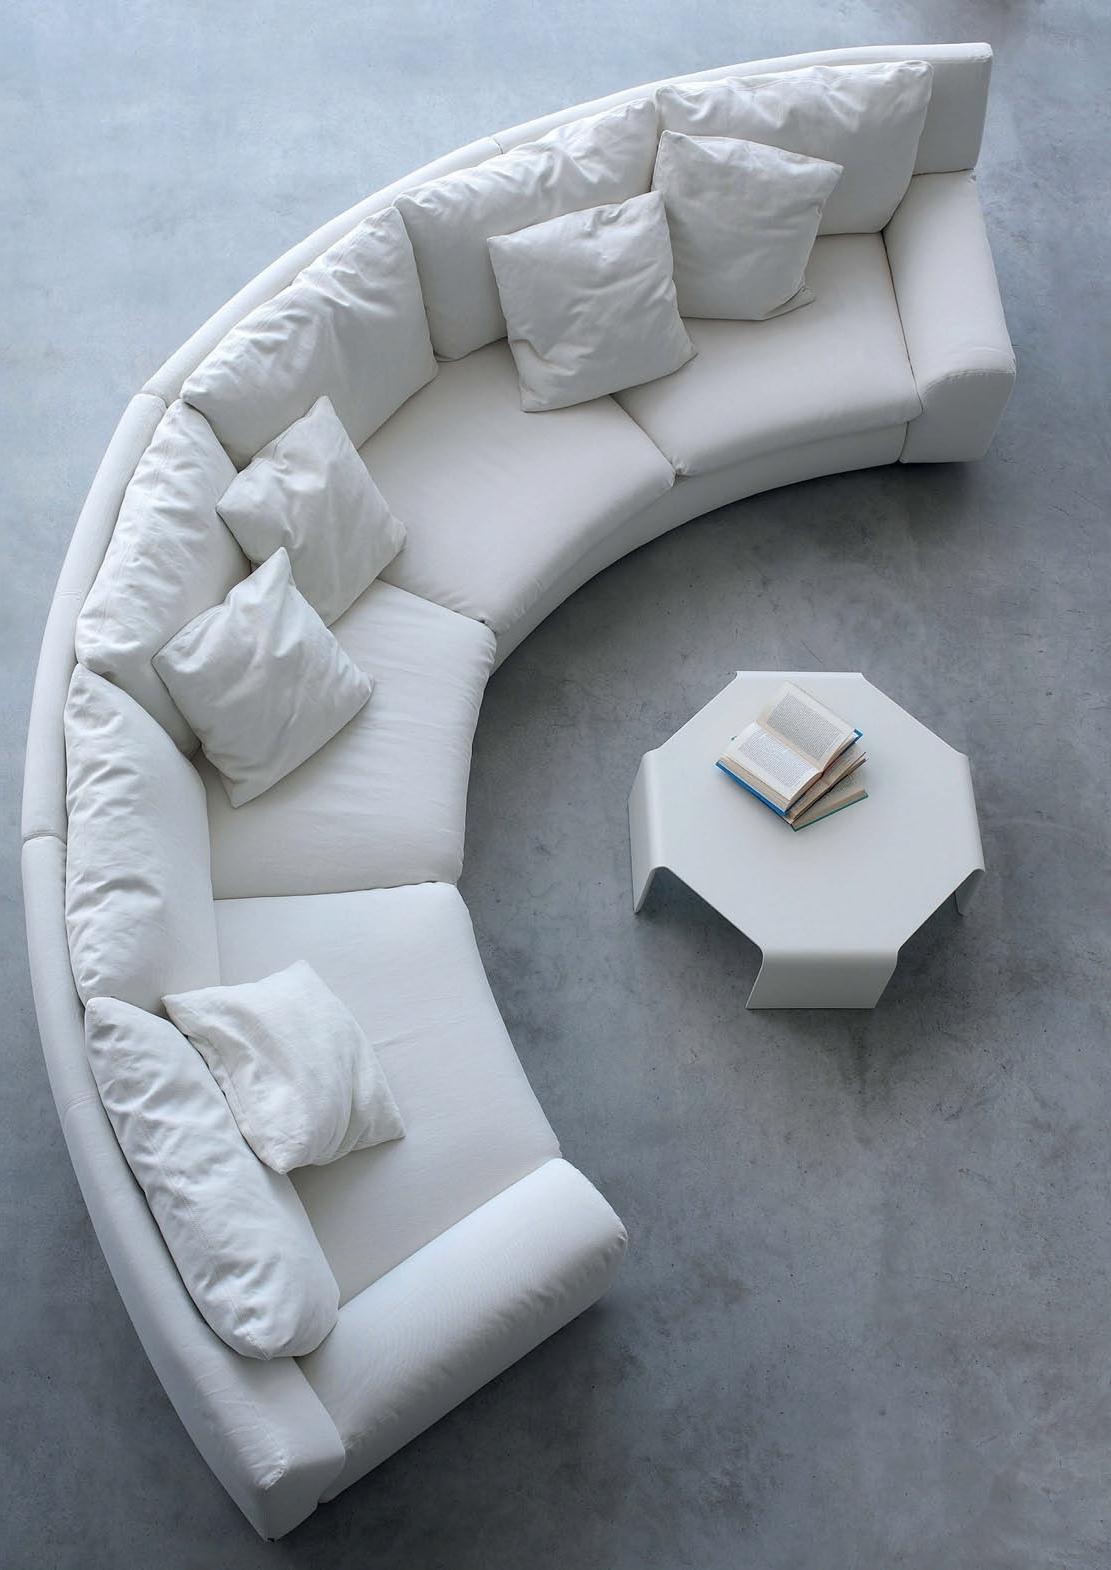 Recent The Semicircular Sofa In Fabric Ben Ben, Arflex – Luxury Furniture Mr Throughout Semicircular Sofas (View 10 of 15)